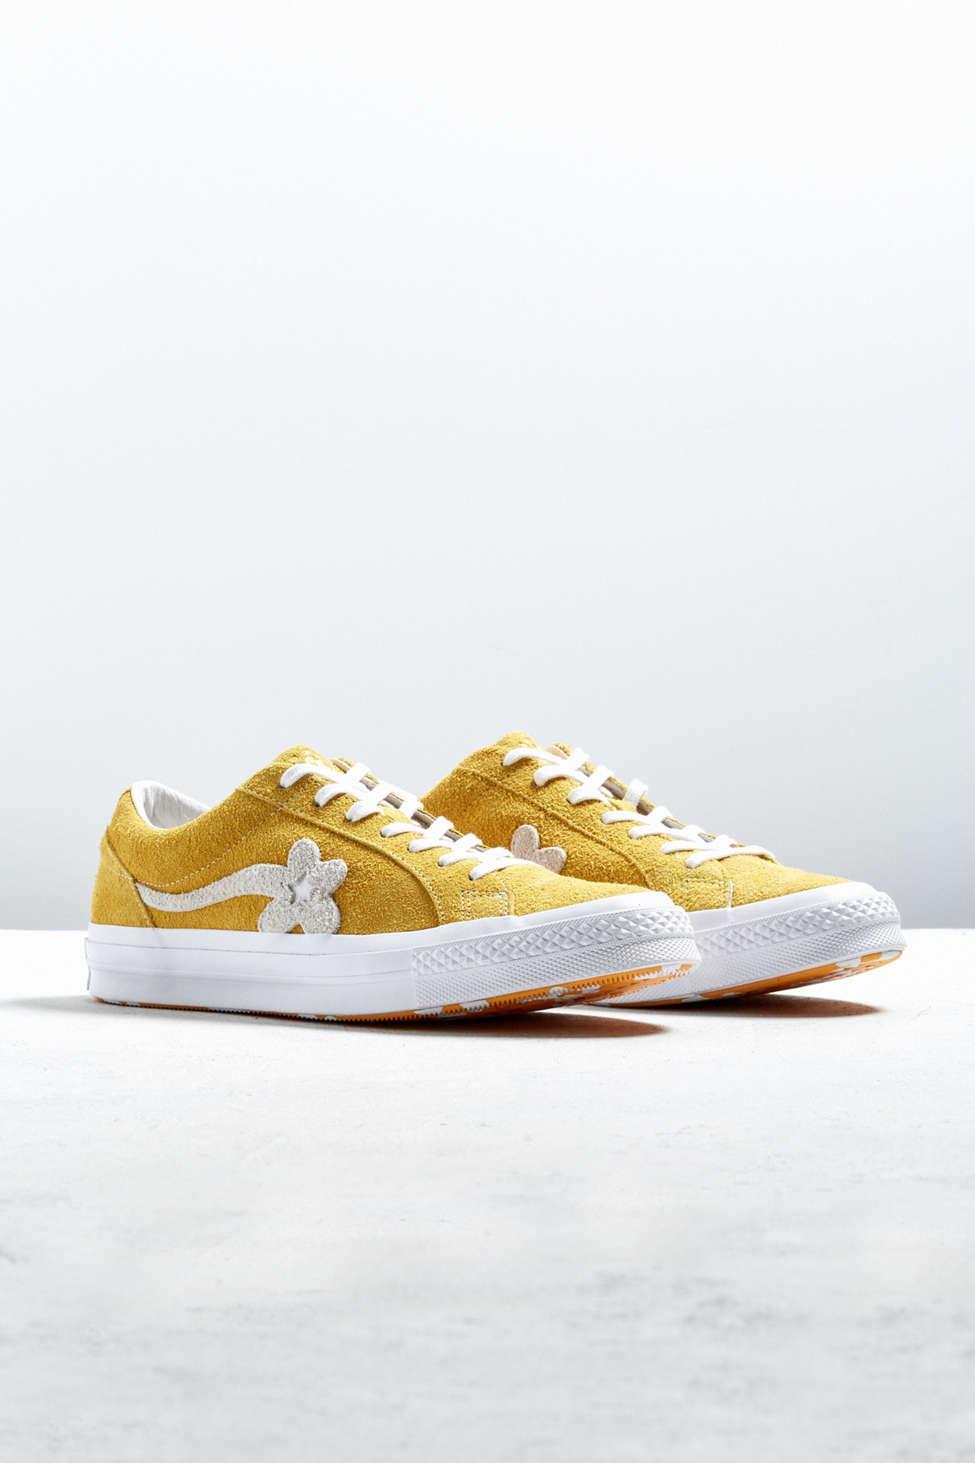 Converse X Golf Le Fleur One Star Sneaker Urban Outfitters